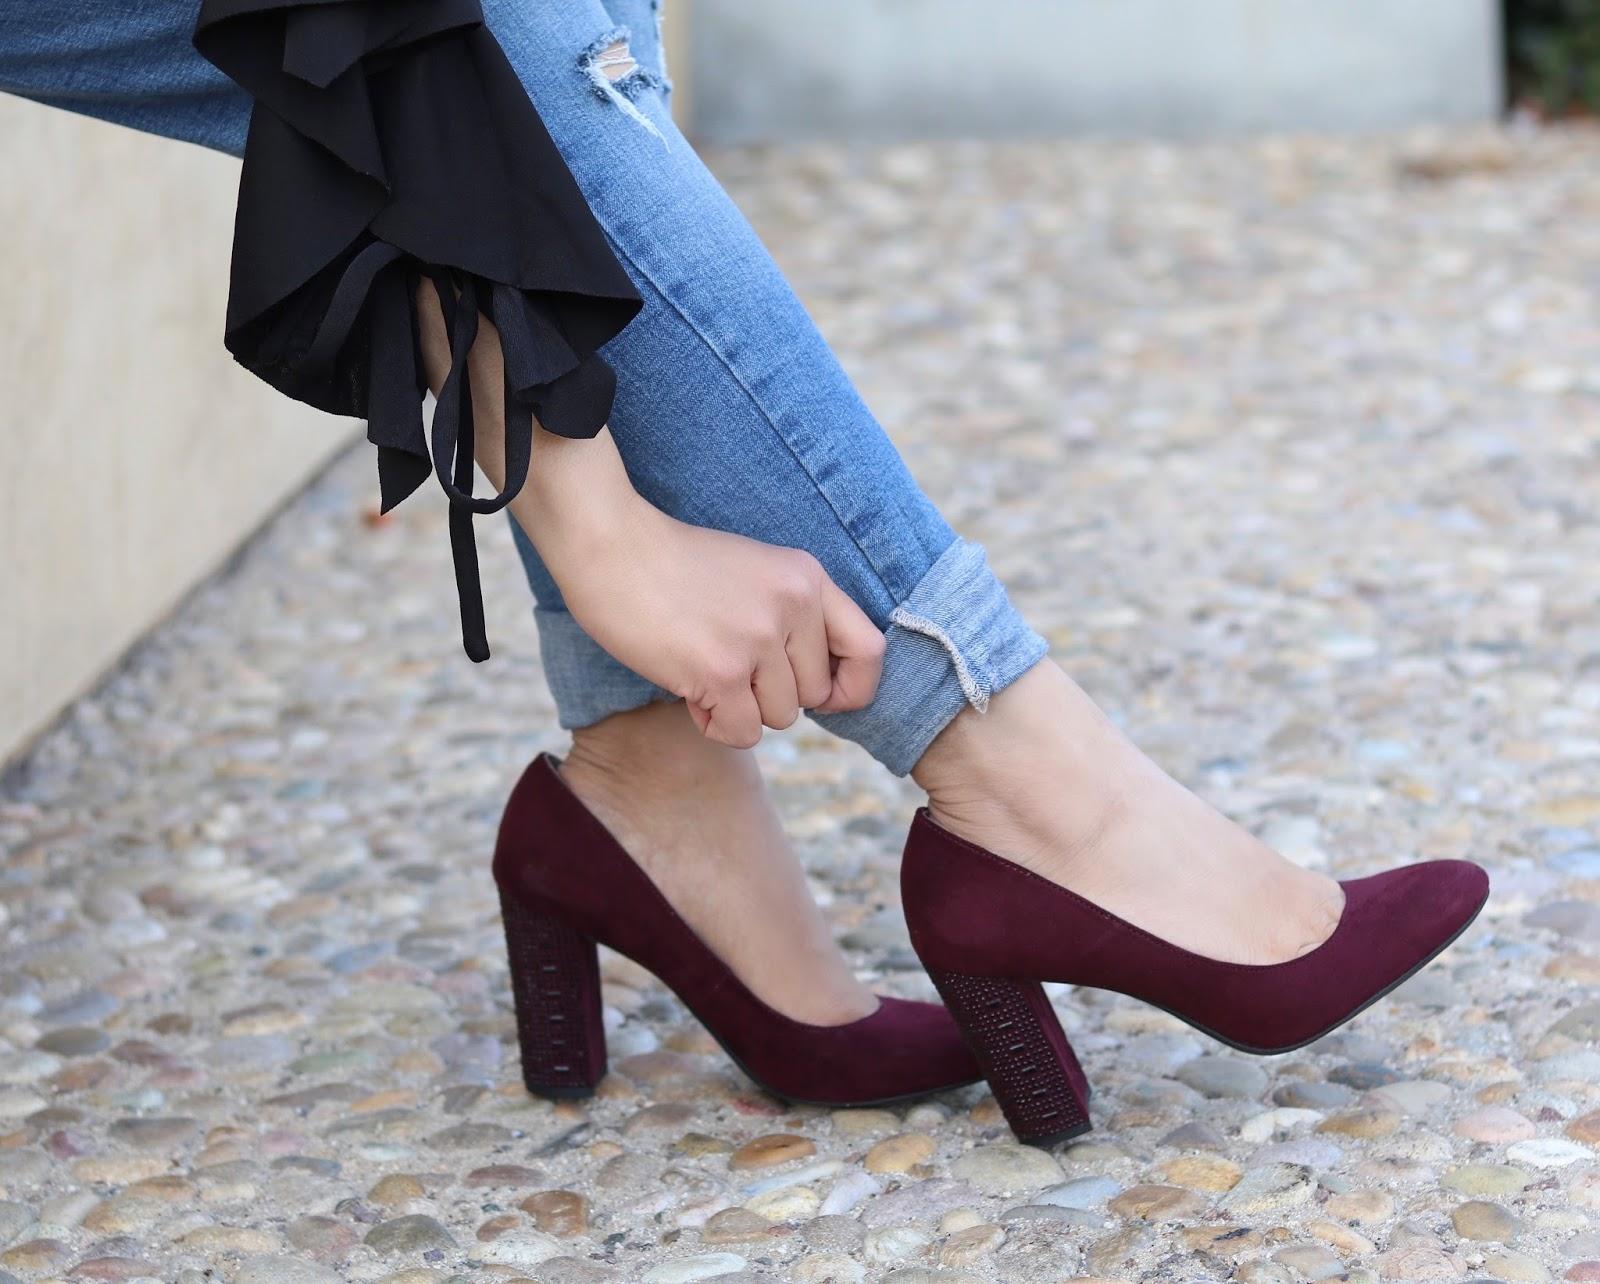 jcpenney libby edelman heels, libby edelman heels, cool heel dretails